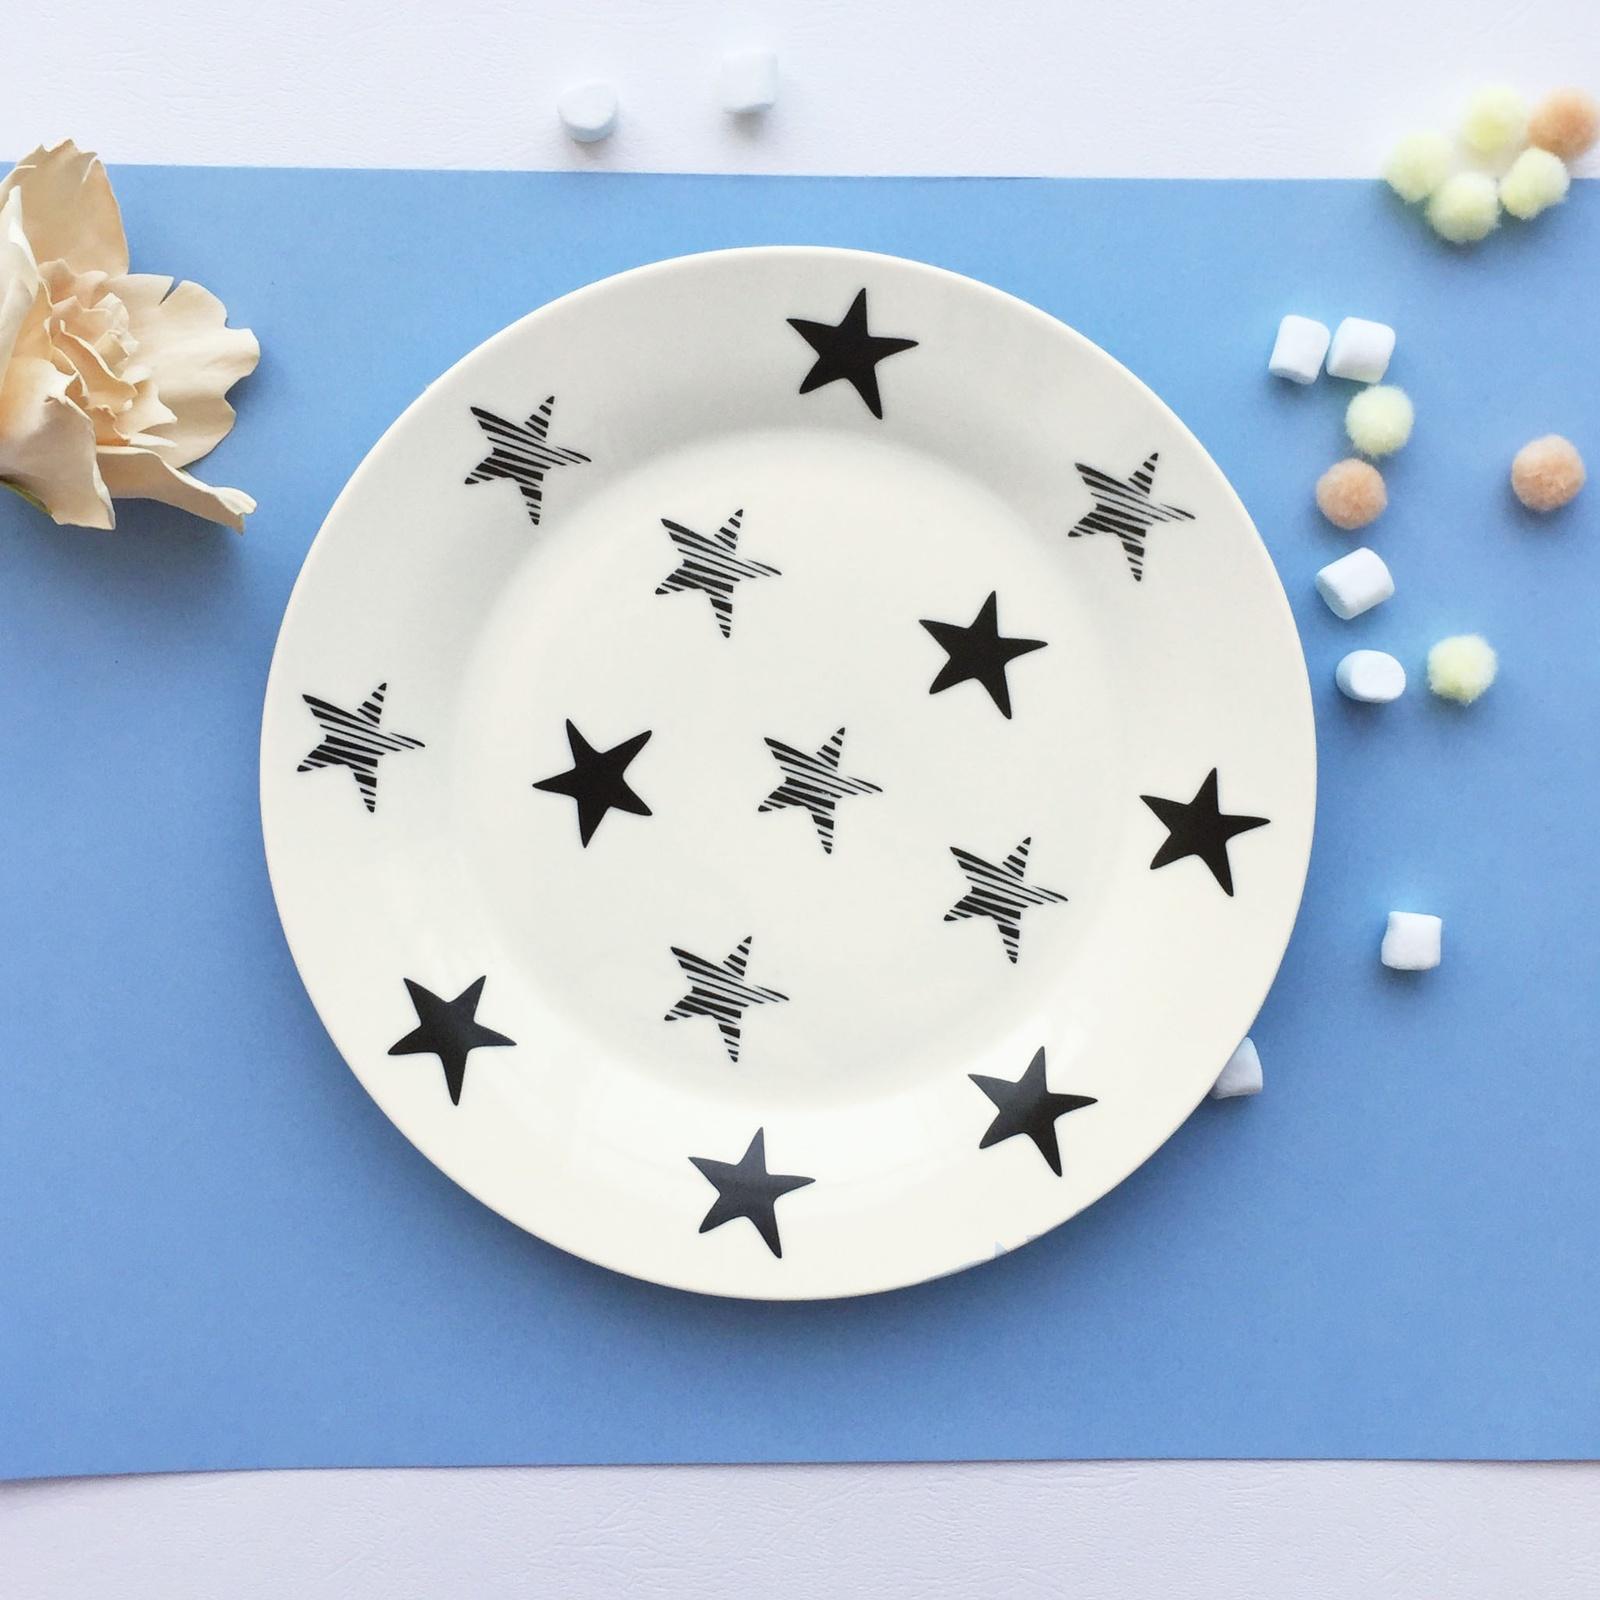 Тарелка My Little Star Vol.2 20 см тарелка мелкая сотвори чудо маленький принц faien диаметр 20 см